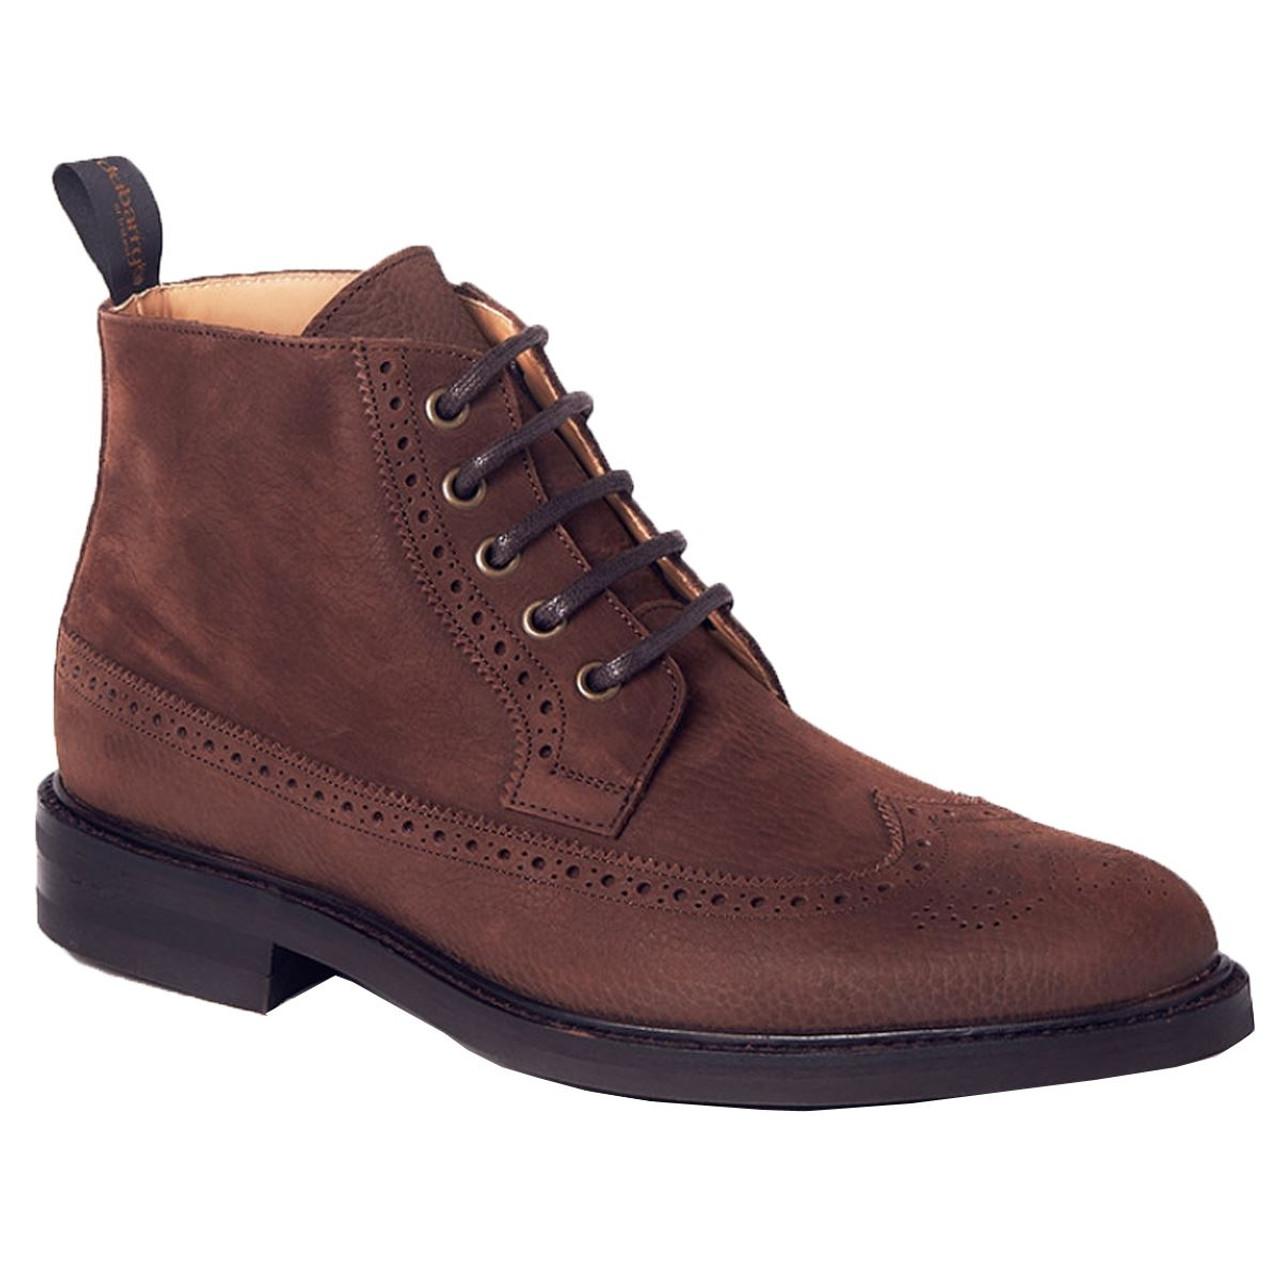 Dubarry Down Boots in Walnut